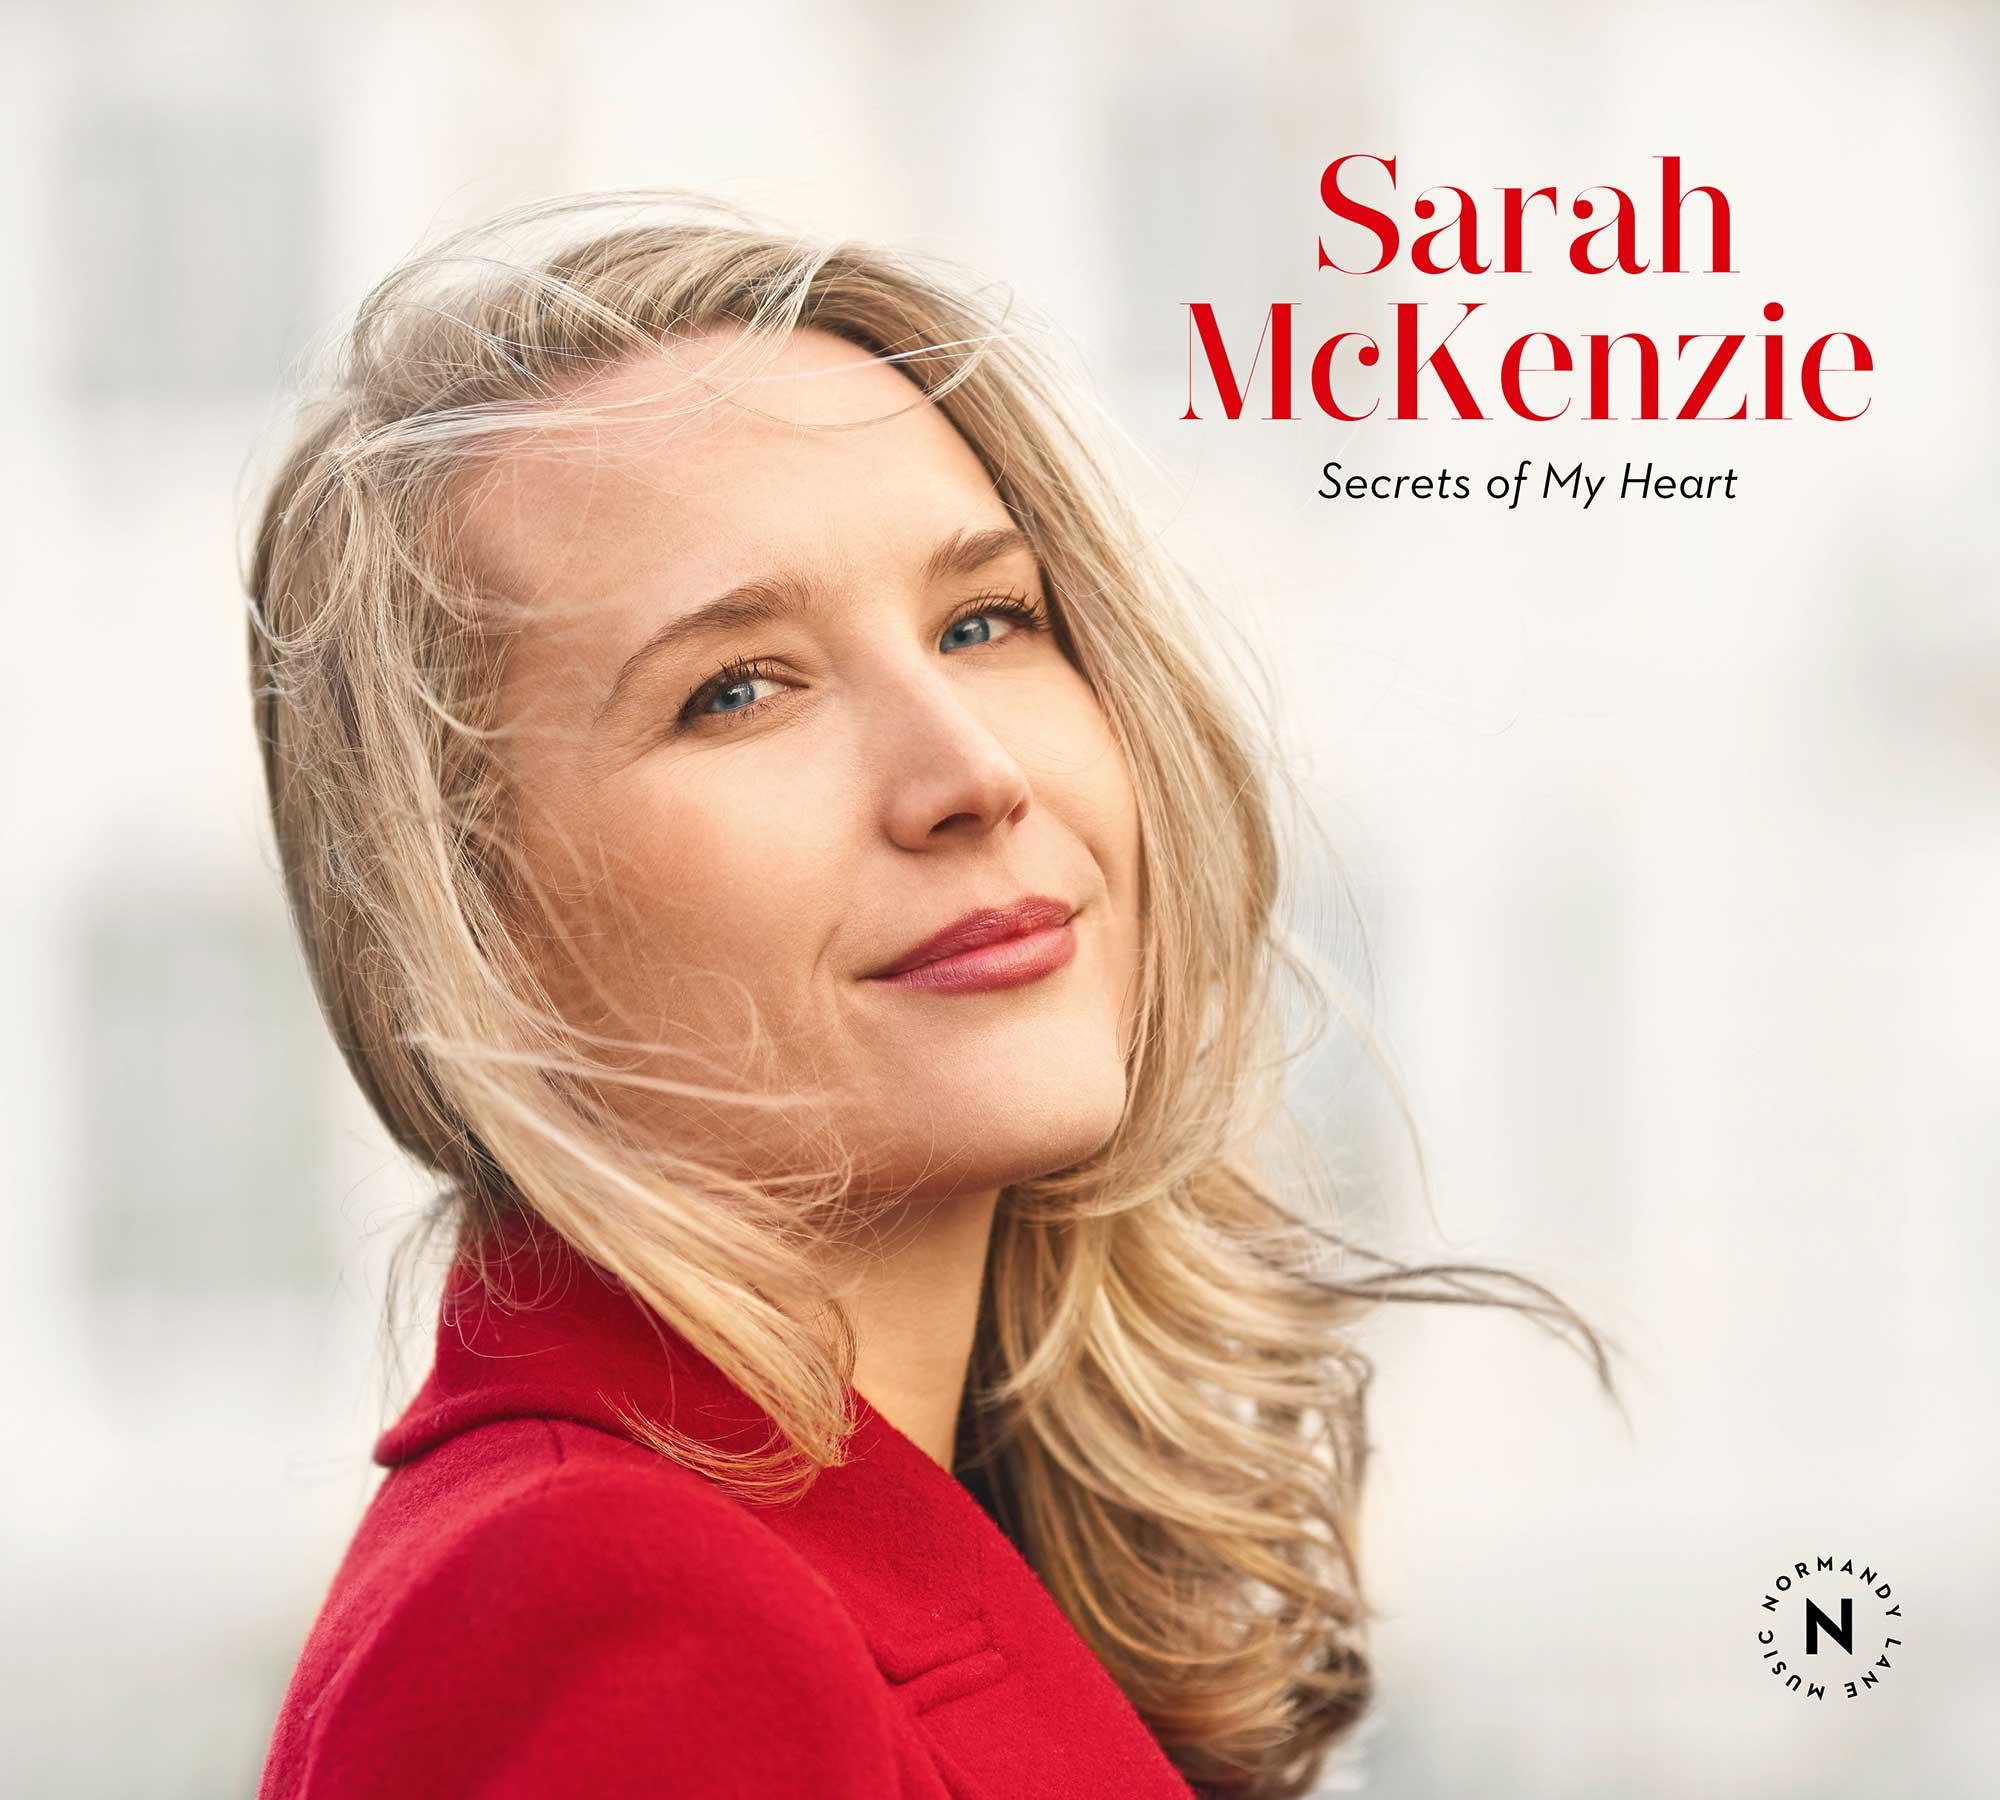 Sarah McKenzie <br/> Secrets of My Heart <br/> Normandy Lane, 2019